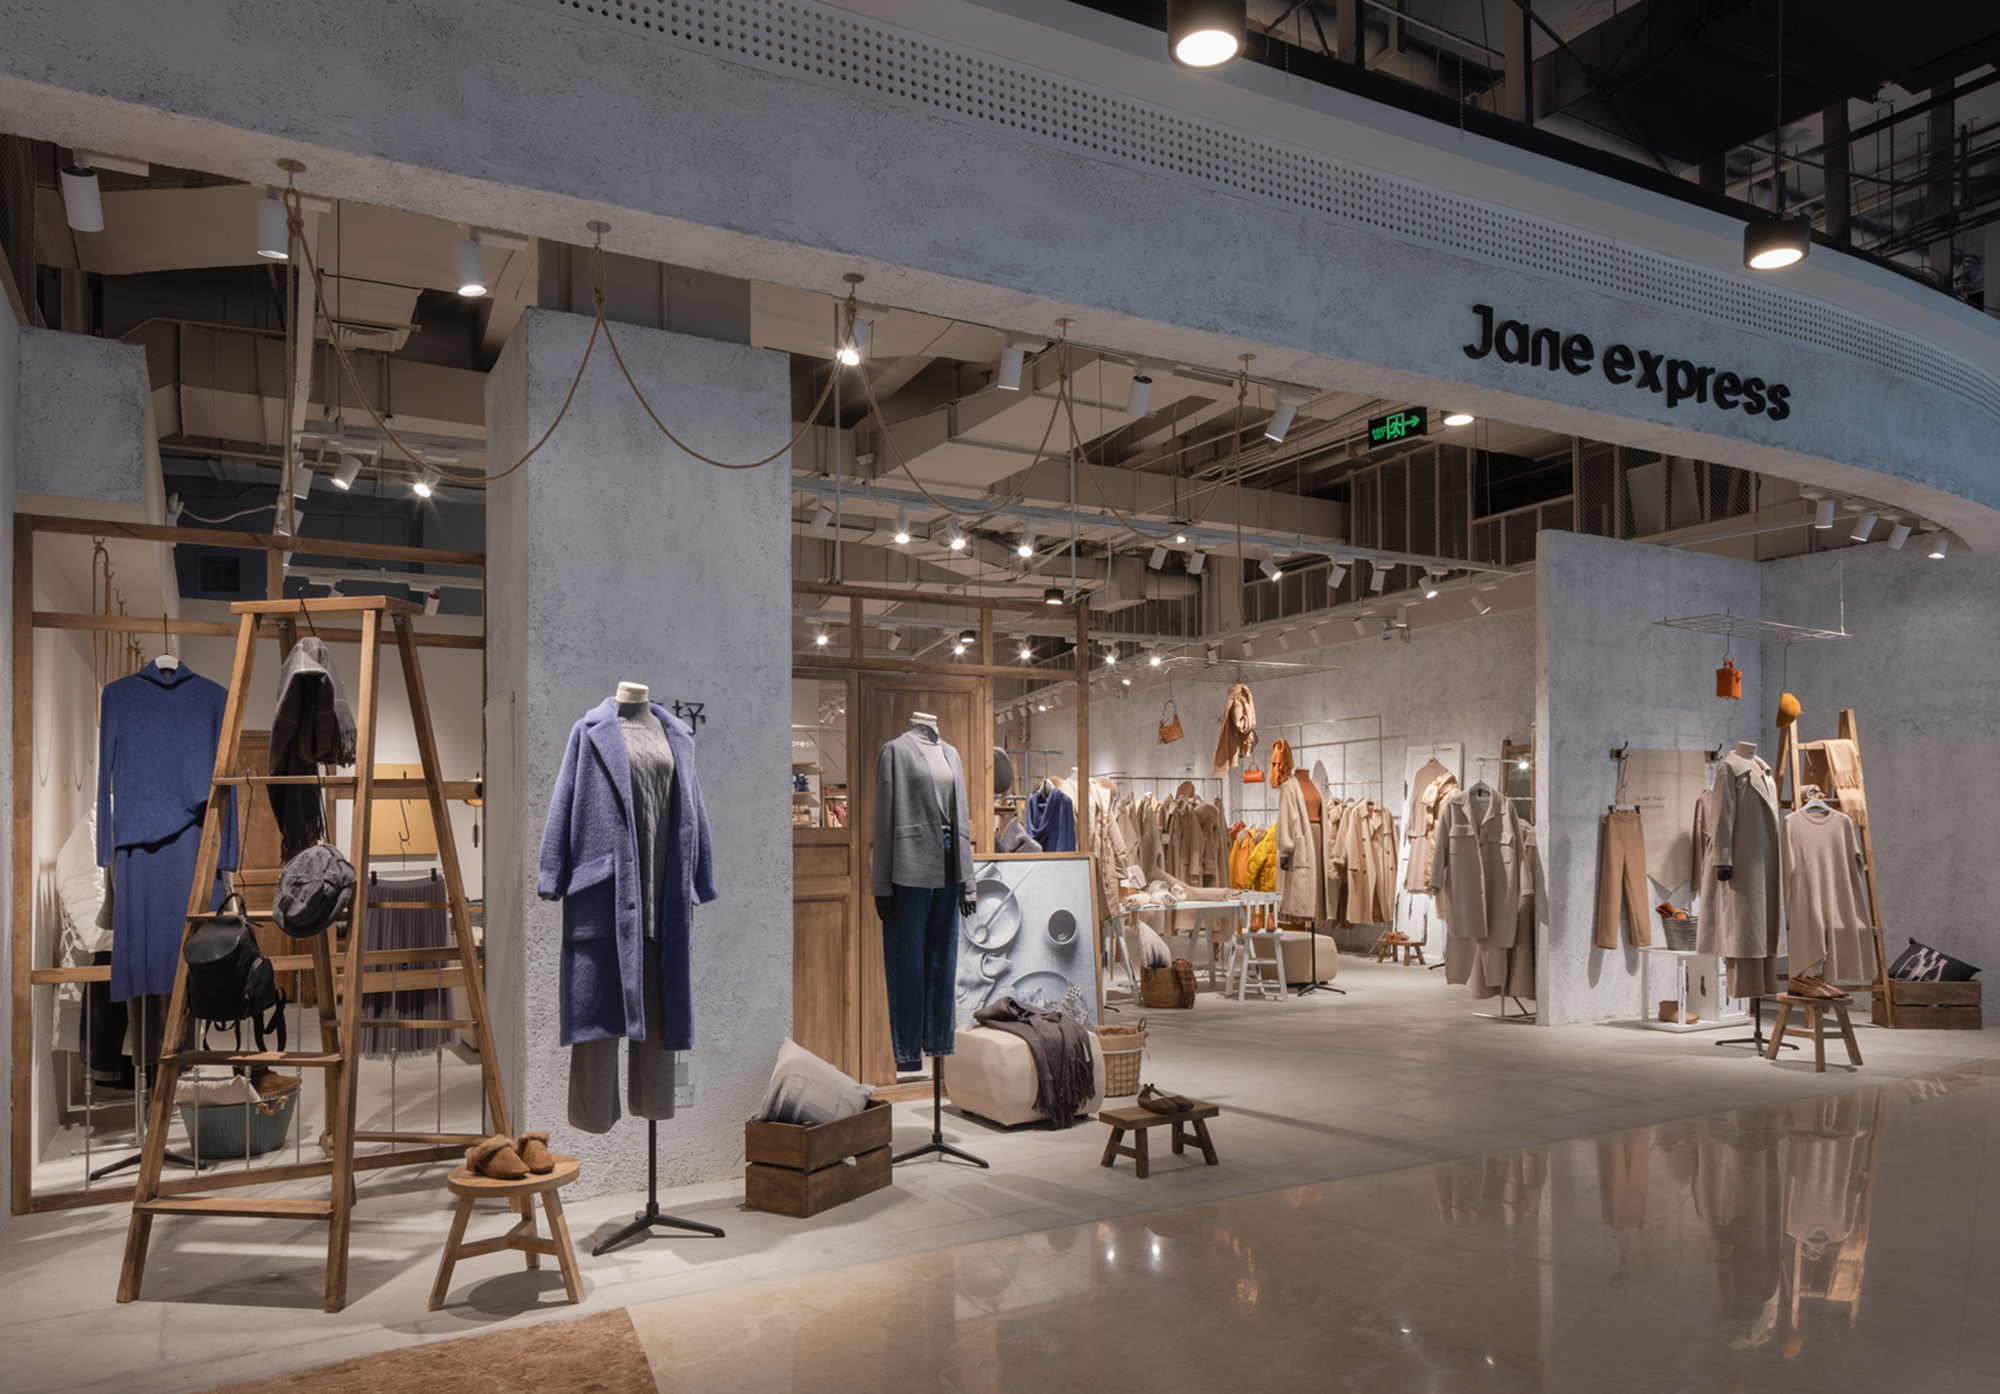 Jane express女装 店铺